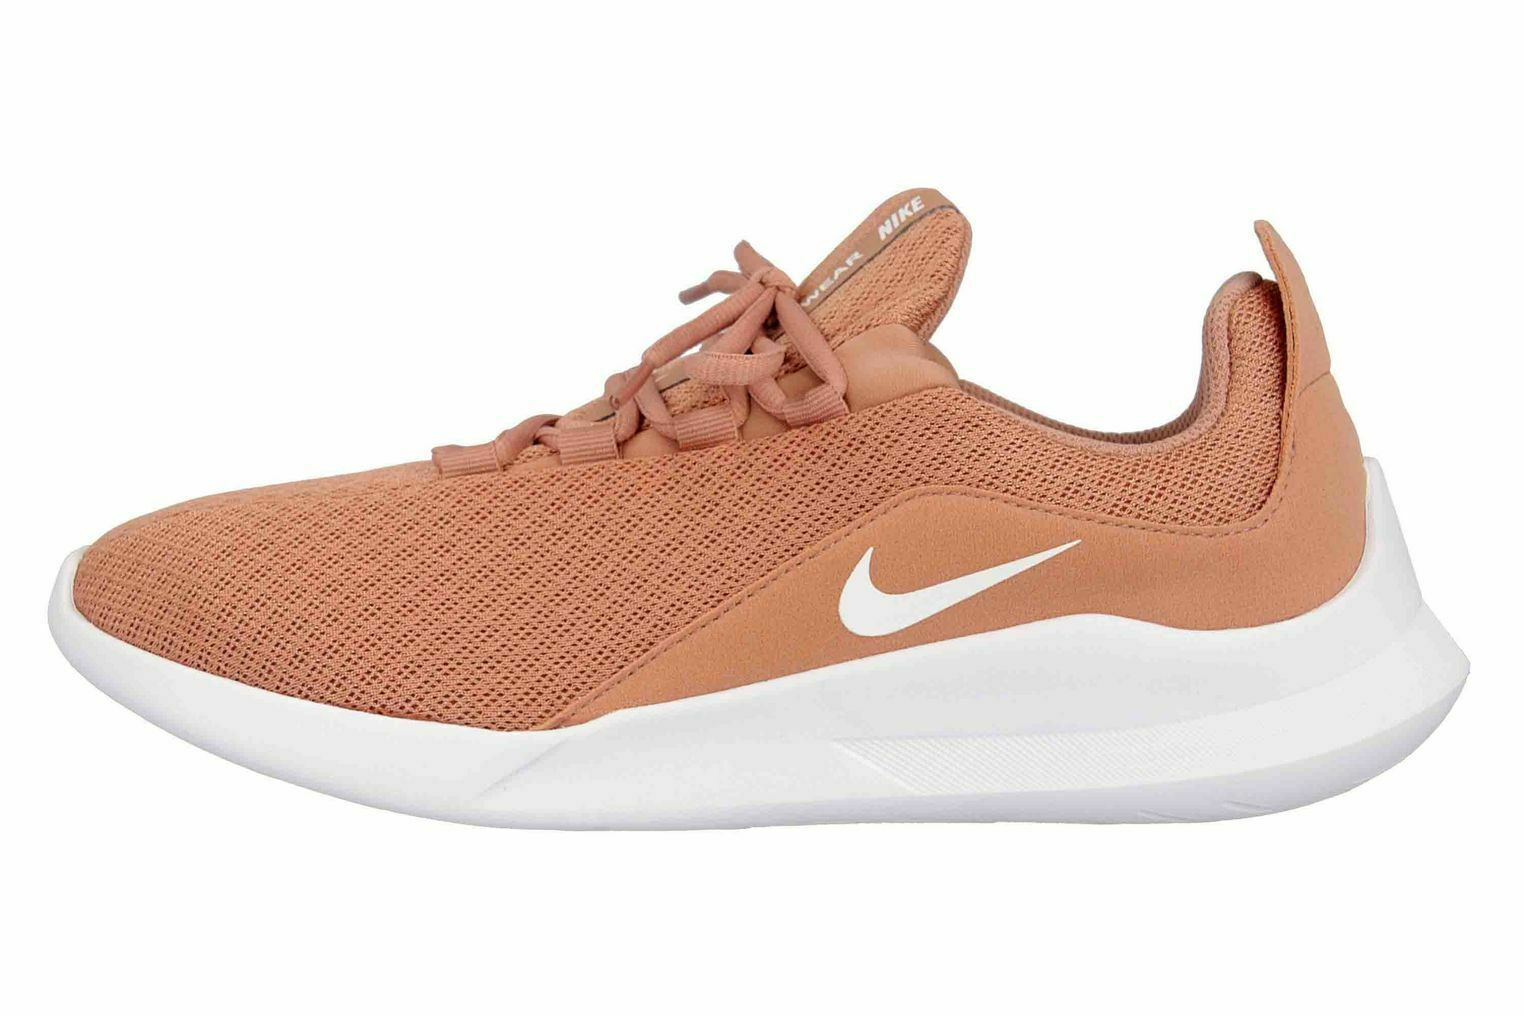 Nike Viale baskets en Grande Taille Rose aa2185 600 Grandes Chaussures Femmes